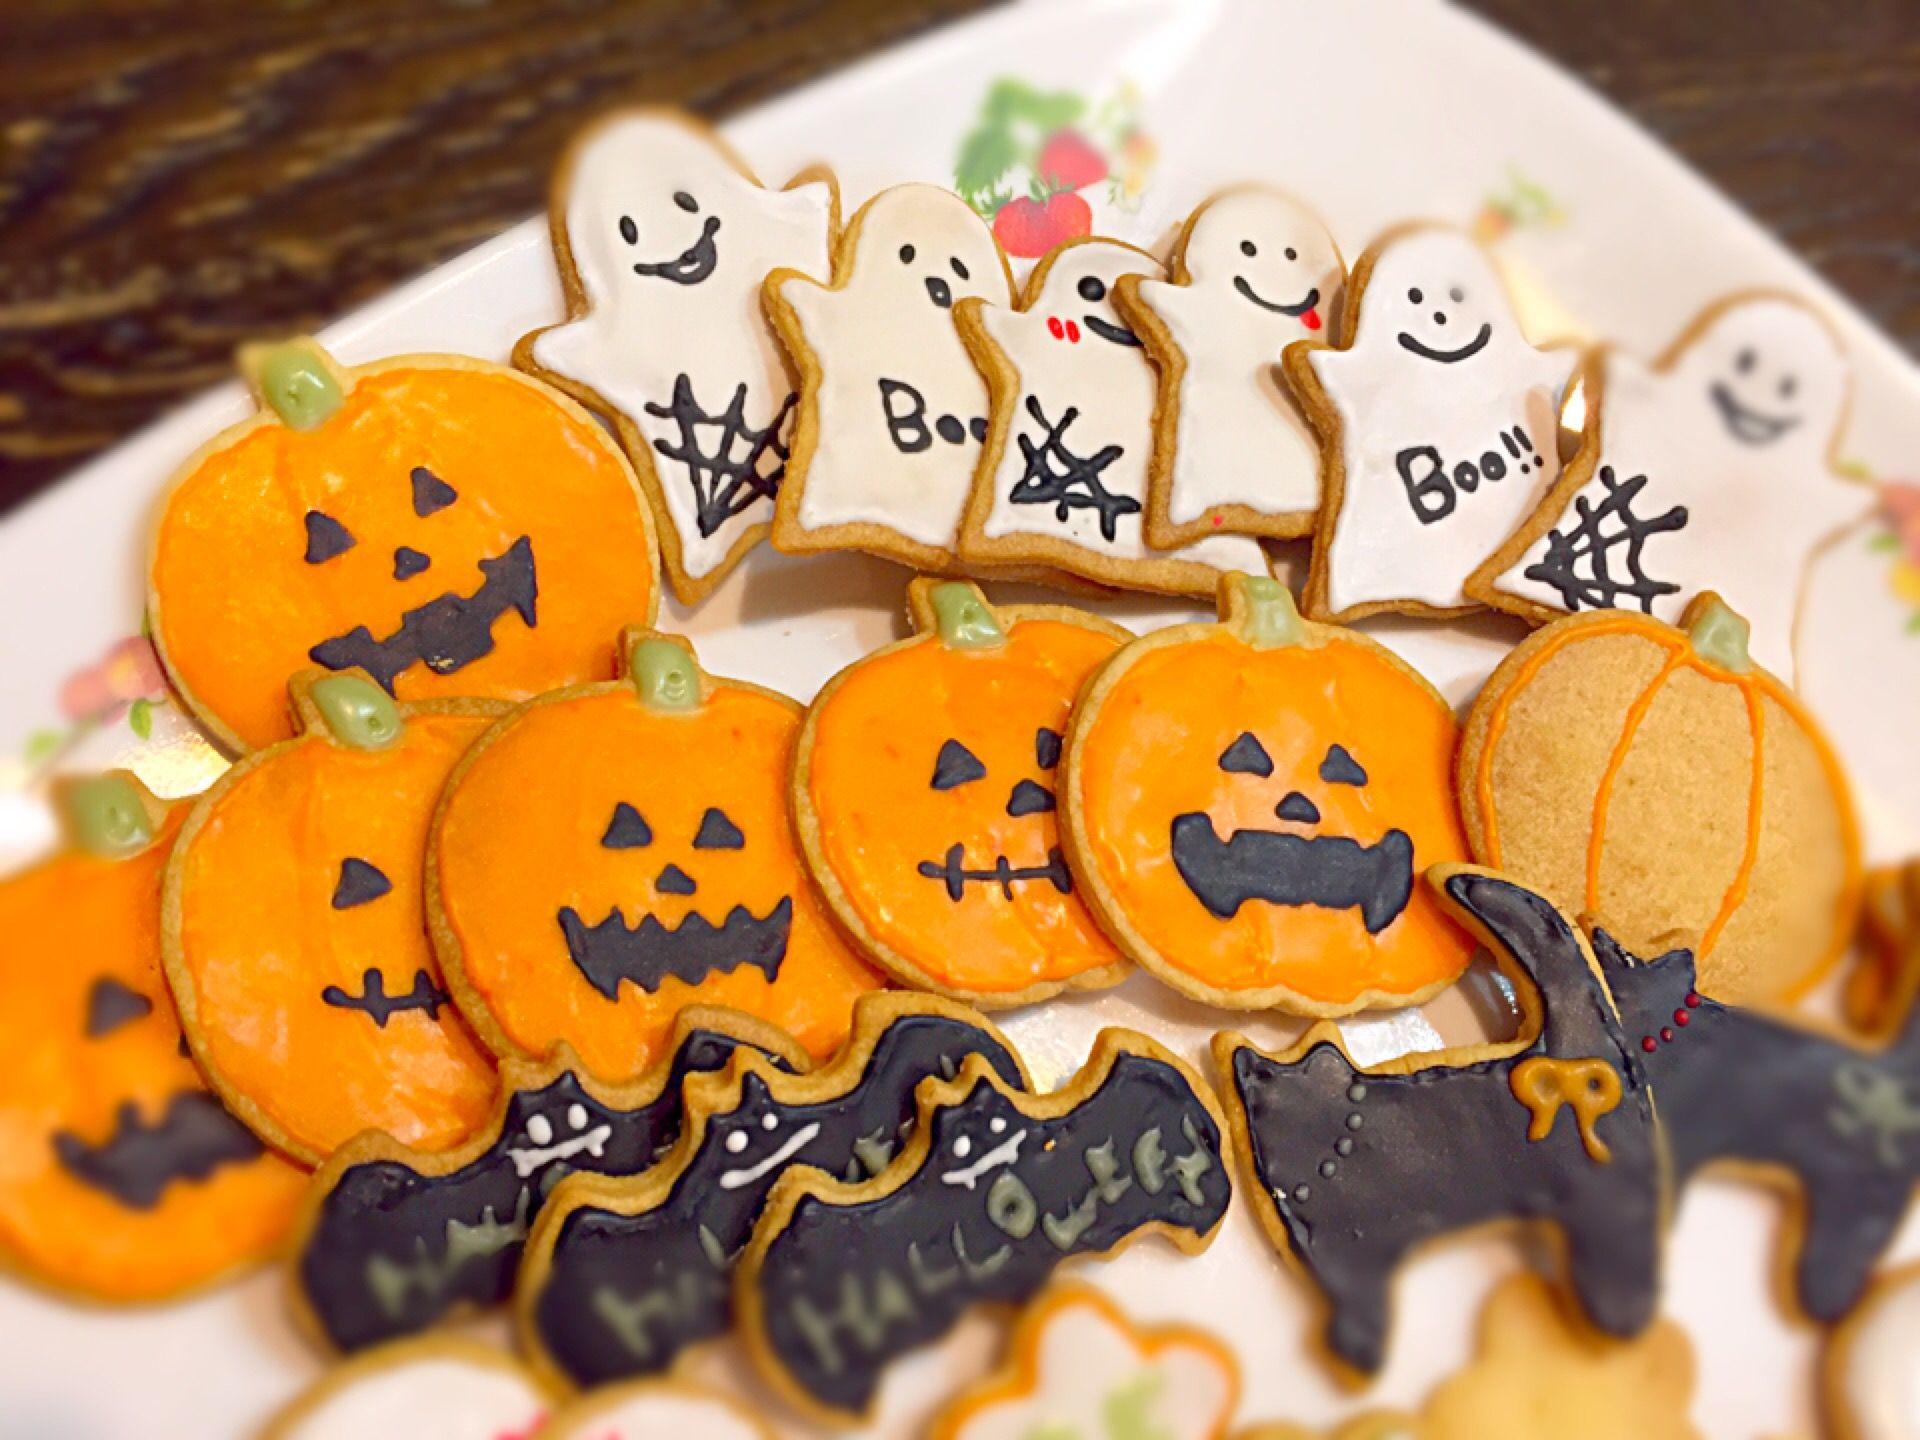 happy Halloween アイシングクッキー初挑戦 Halloween アイシングクッキー【2020